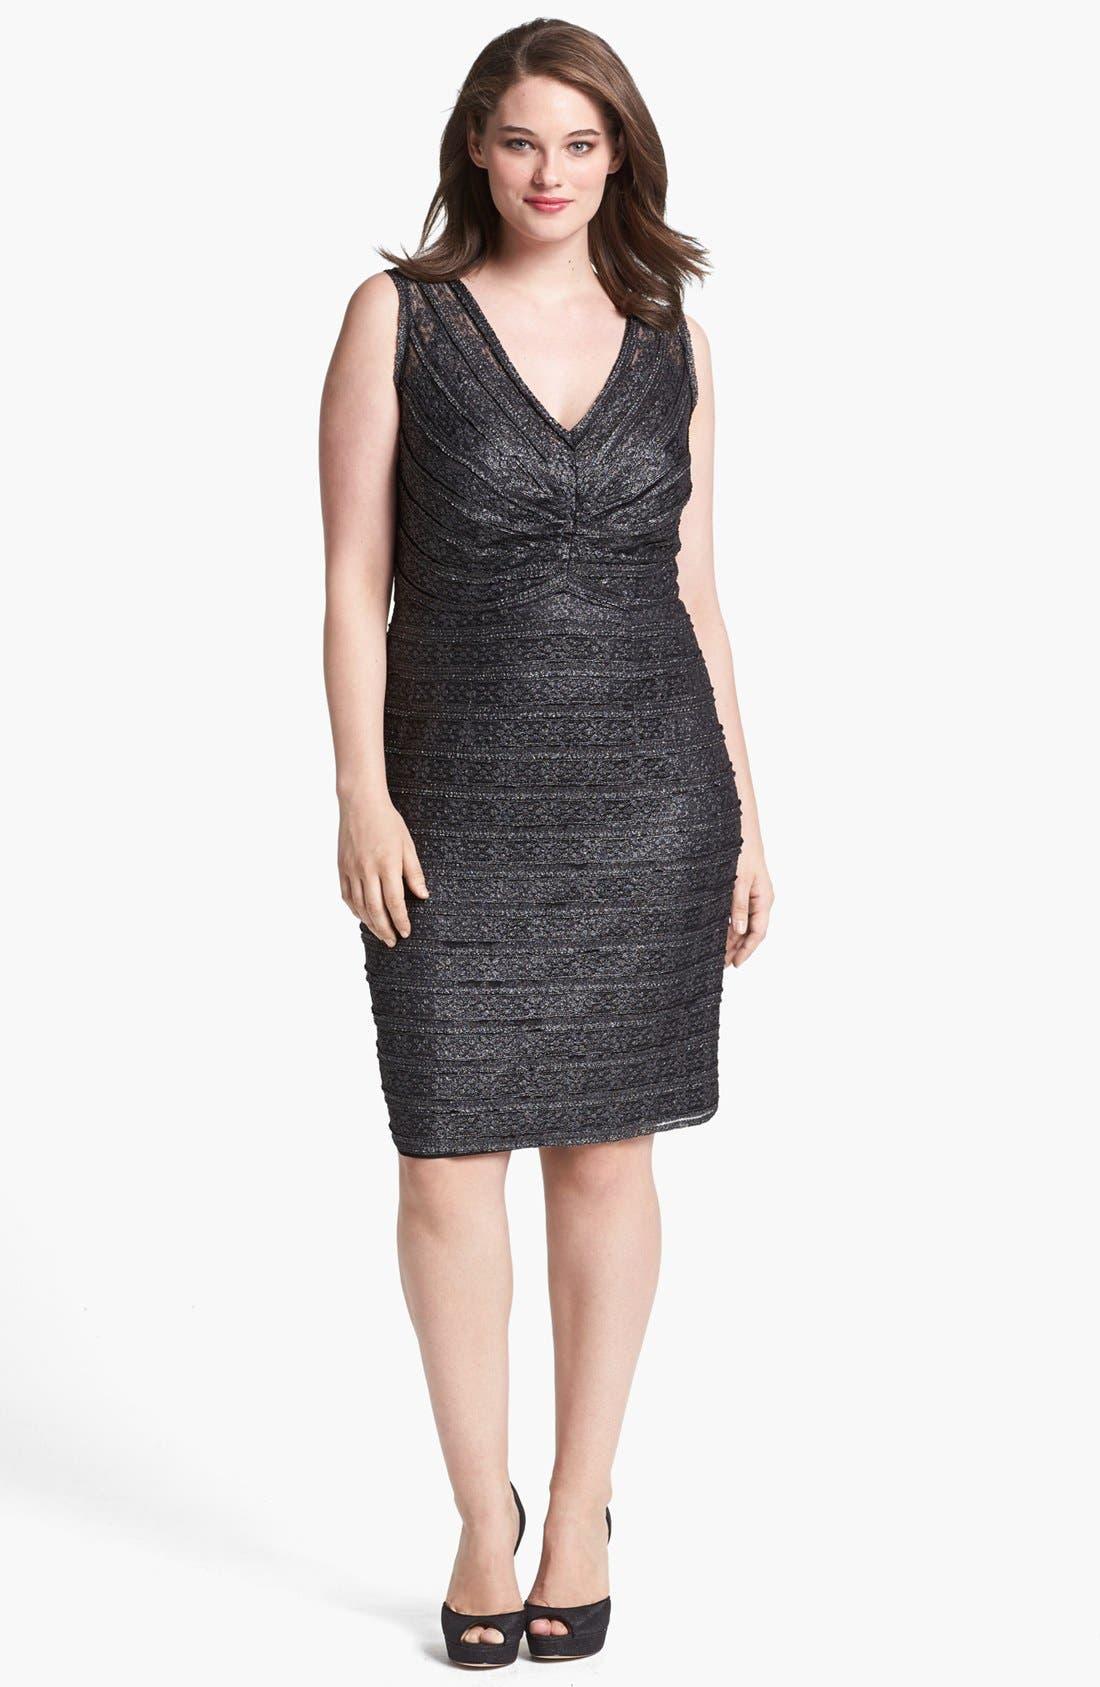 Alternate Image 1 Selected - Calvin Klein Metallic Lace Sheath Dress (Plus Size)